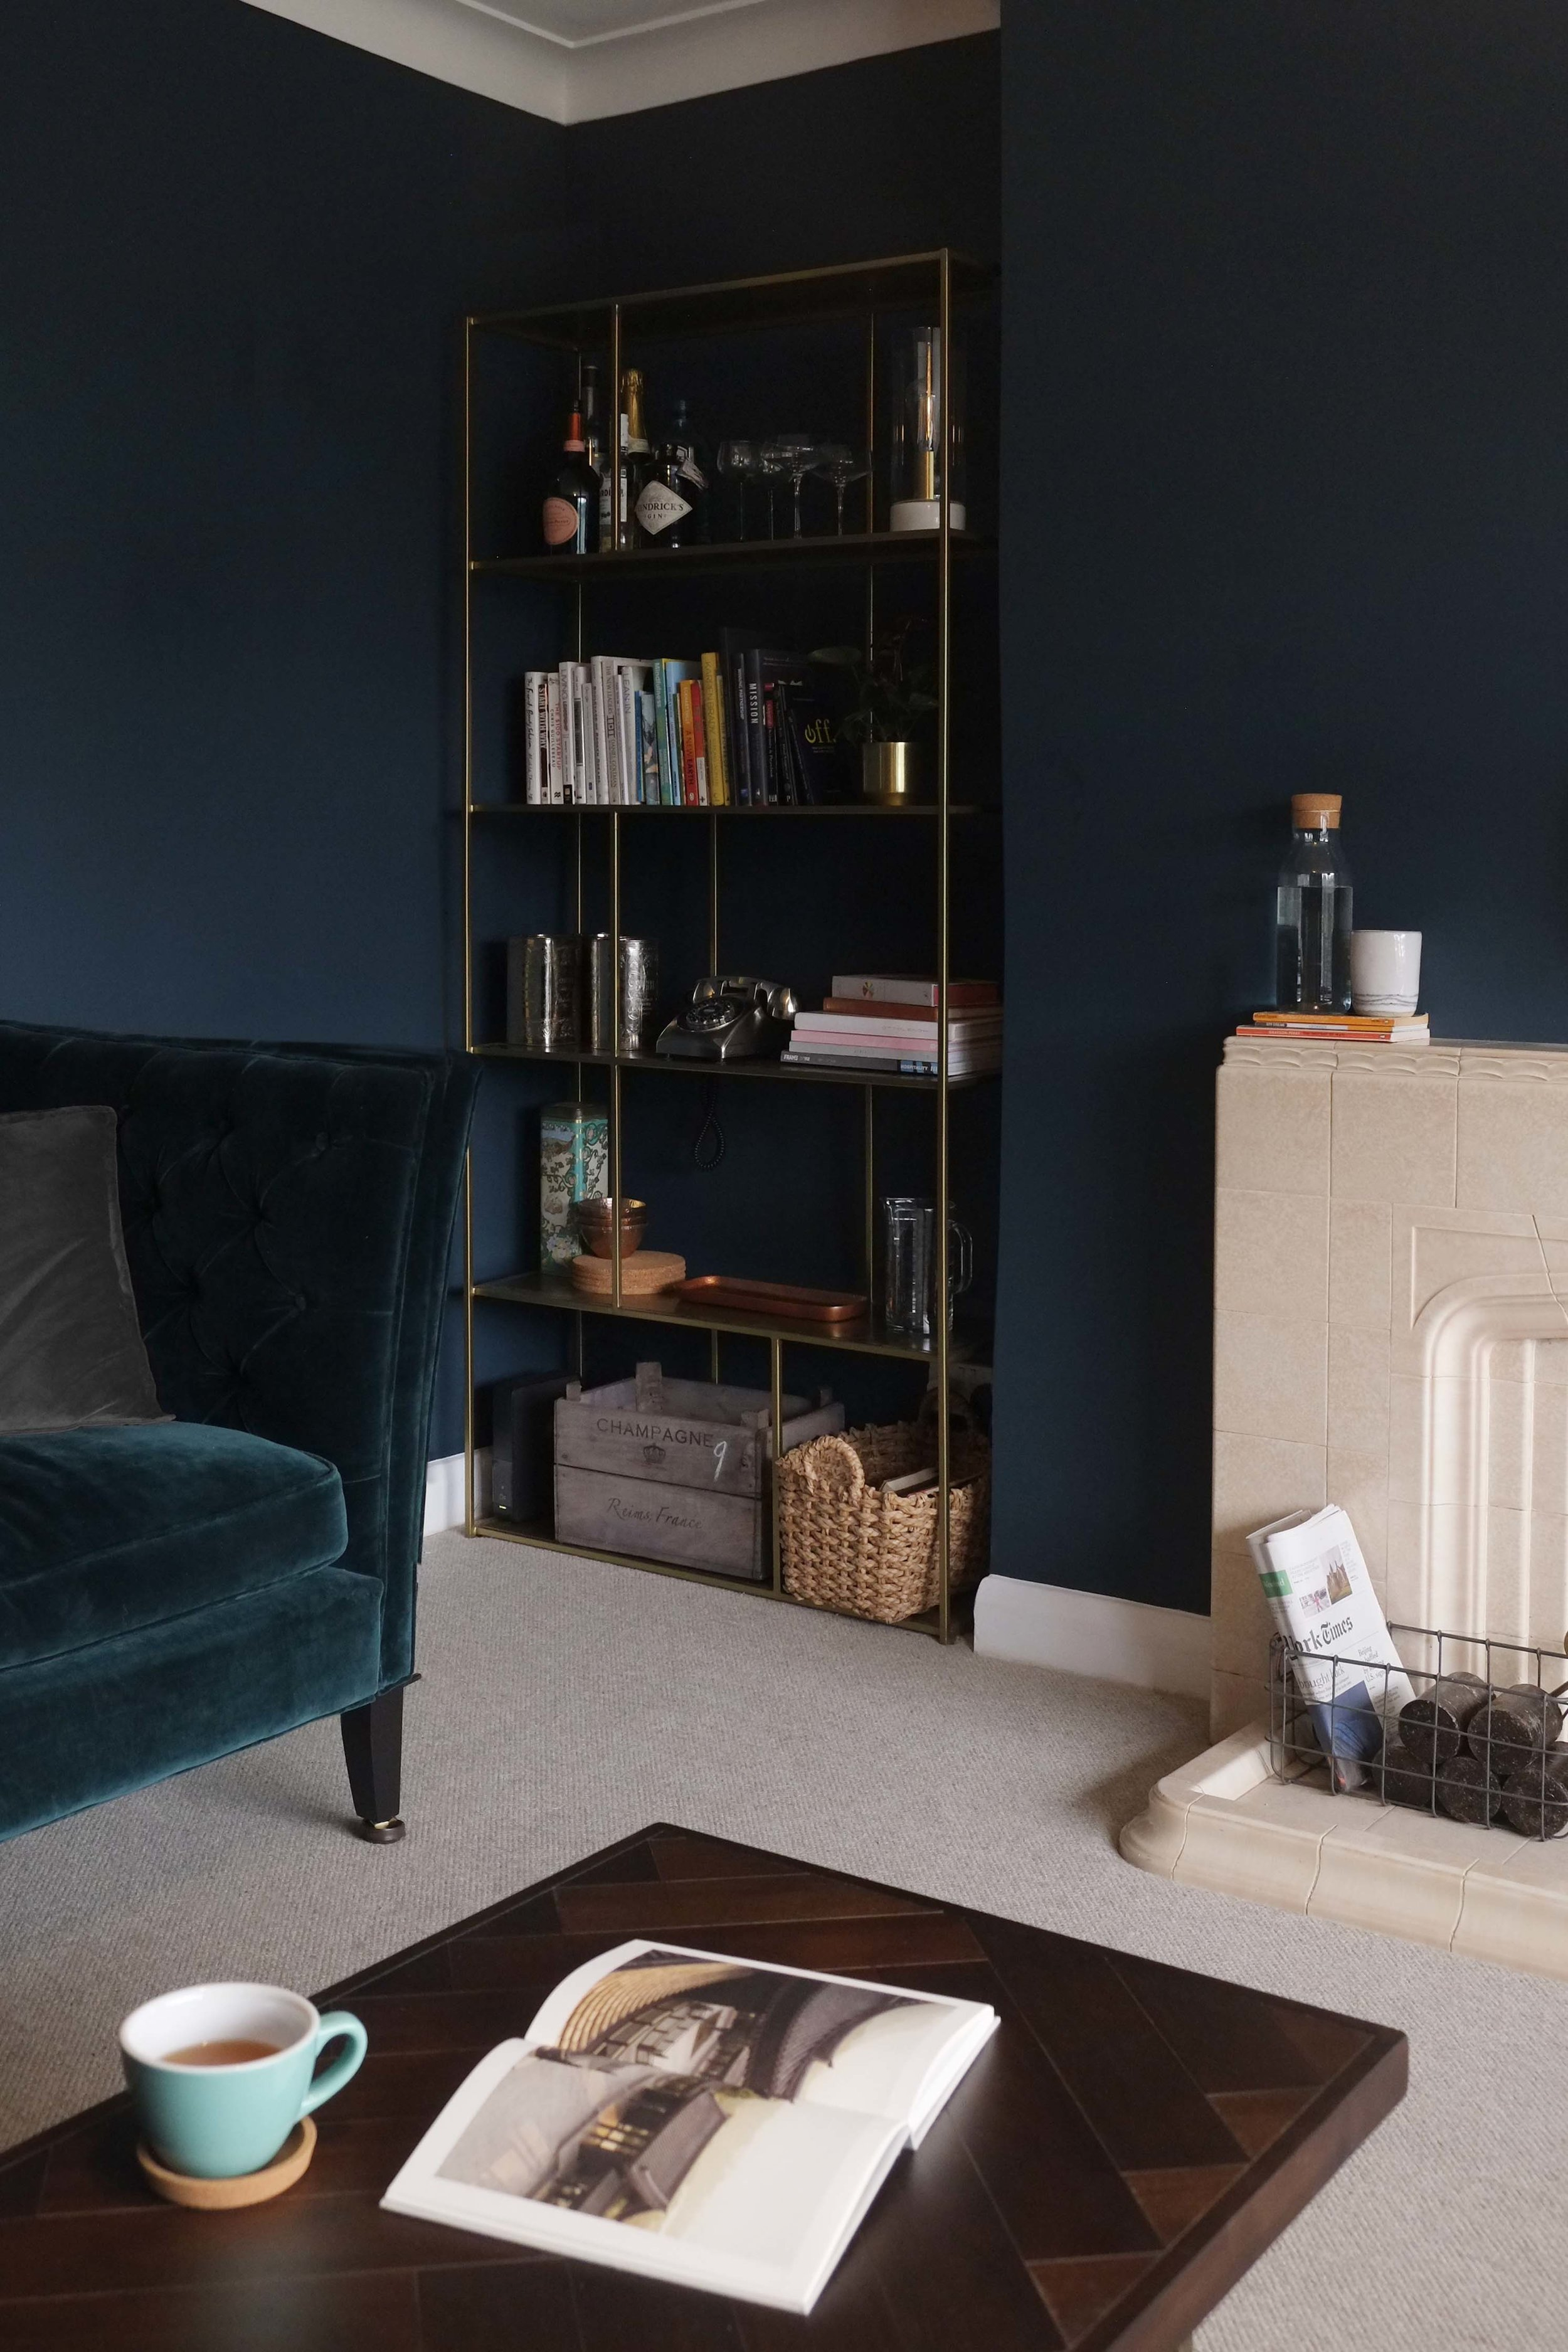 lunarlunar_interior_design_apartment_art_deco_deanhill_lounge_4.jpg